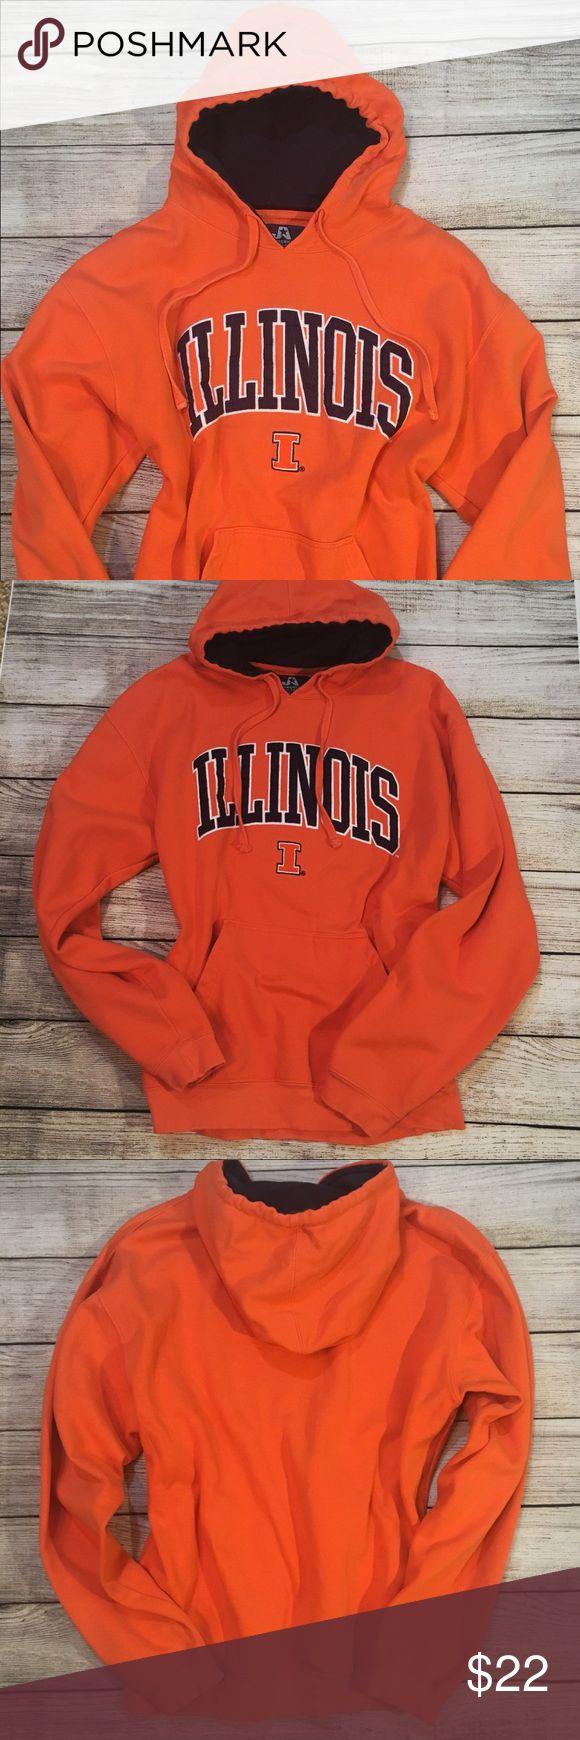 Illinois Fighting Illini Sweatshirt Men's Large Bright orange Fighting Illini pullover hoodie sweatshirt with drawstring closure, black lining and front pockets. Cotton/Polyester. Size Men's Large. J. America Sportswear Shirts Sweatshirts & Hoodies